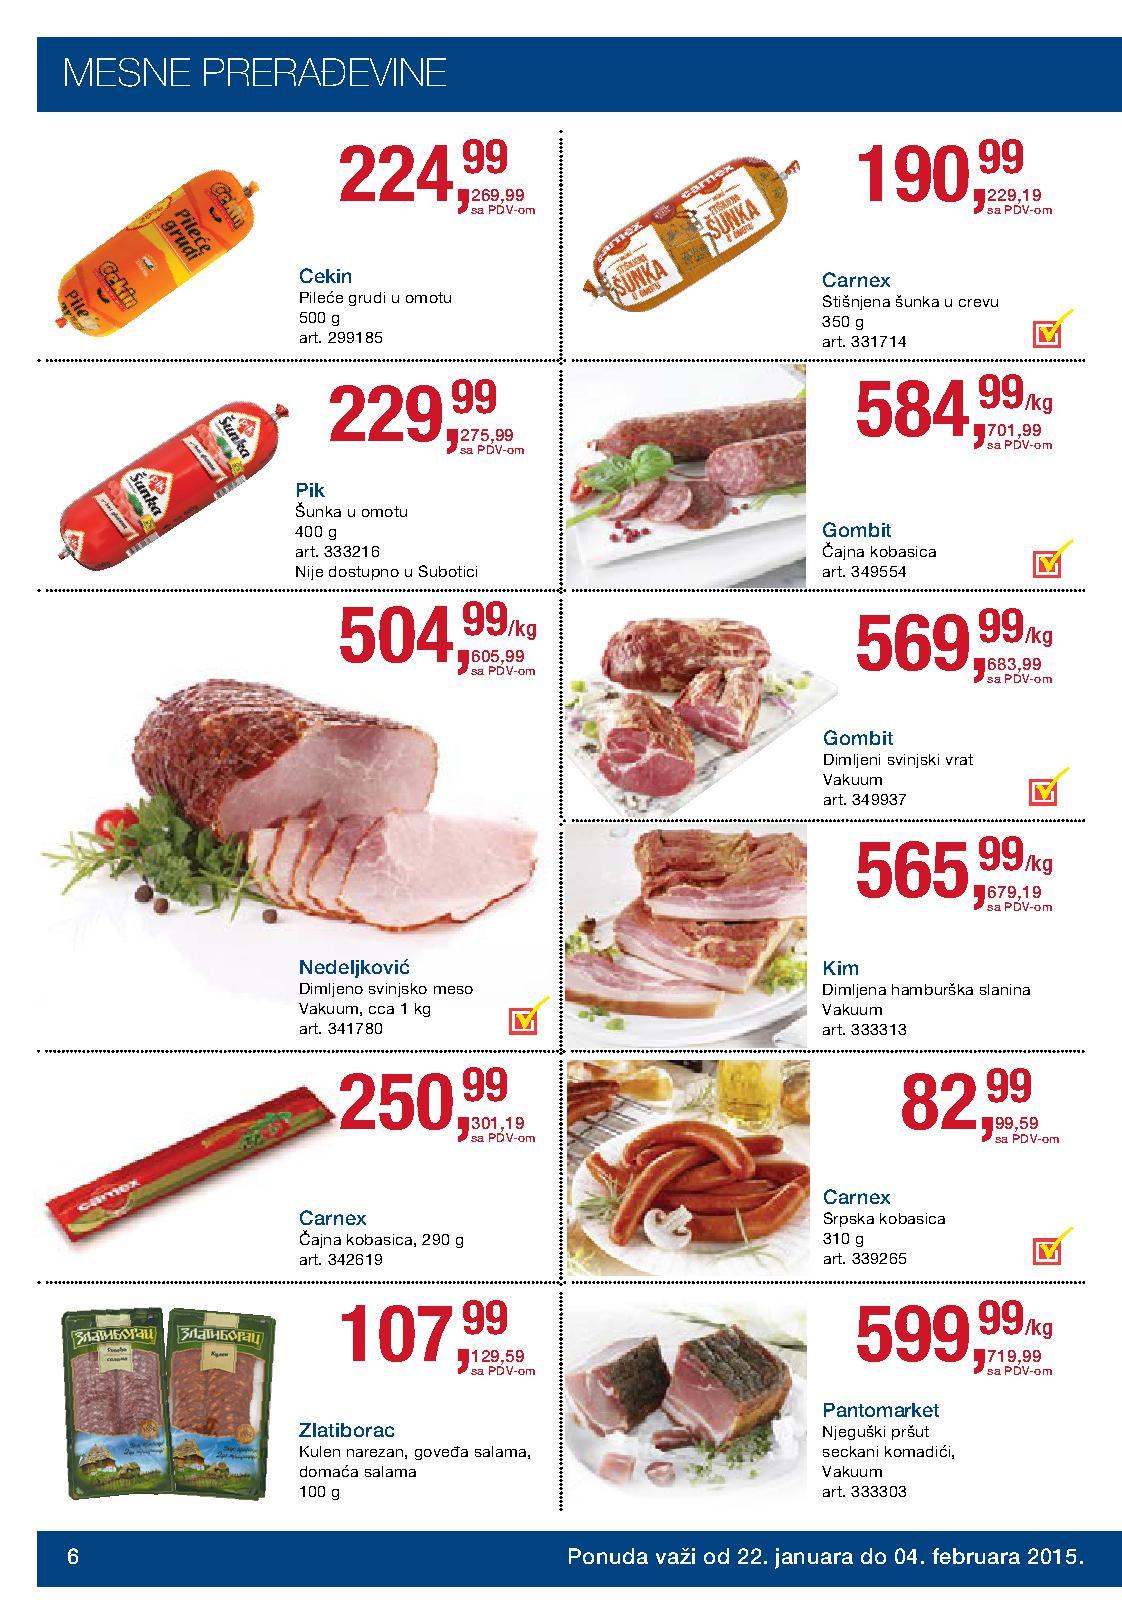 Metro akcija sjajne cece prehrane za vas